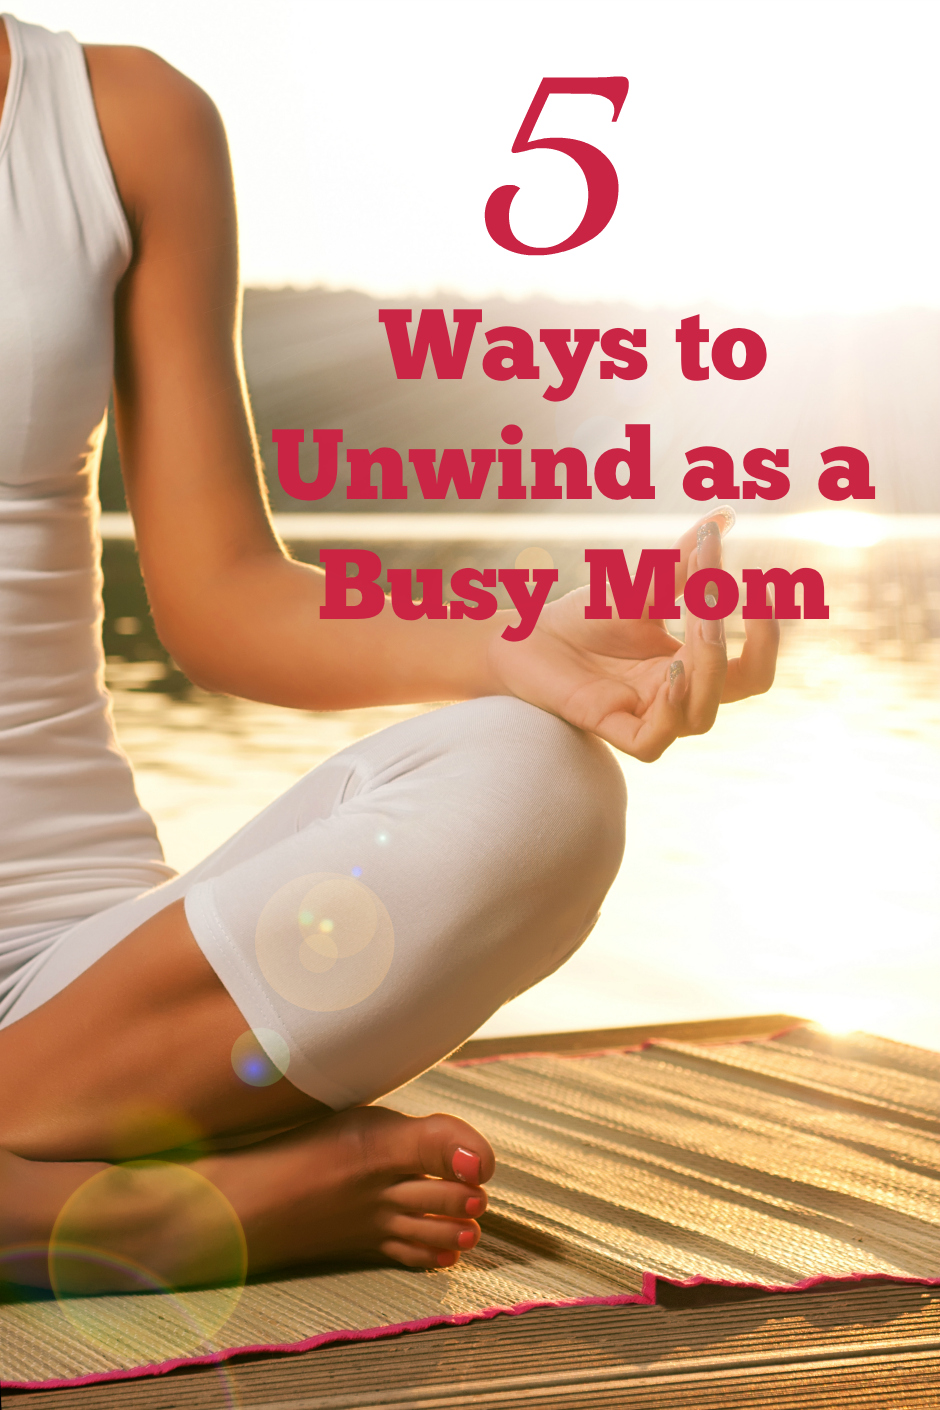 5 Ways to Unwind as a Busy Mom